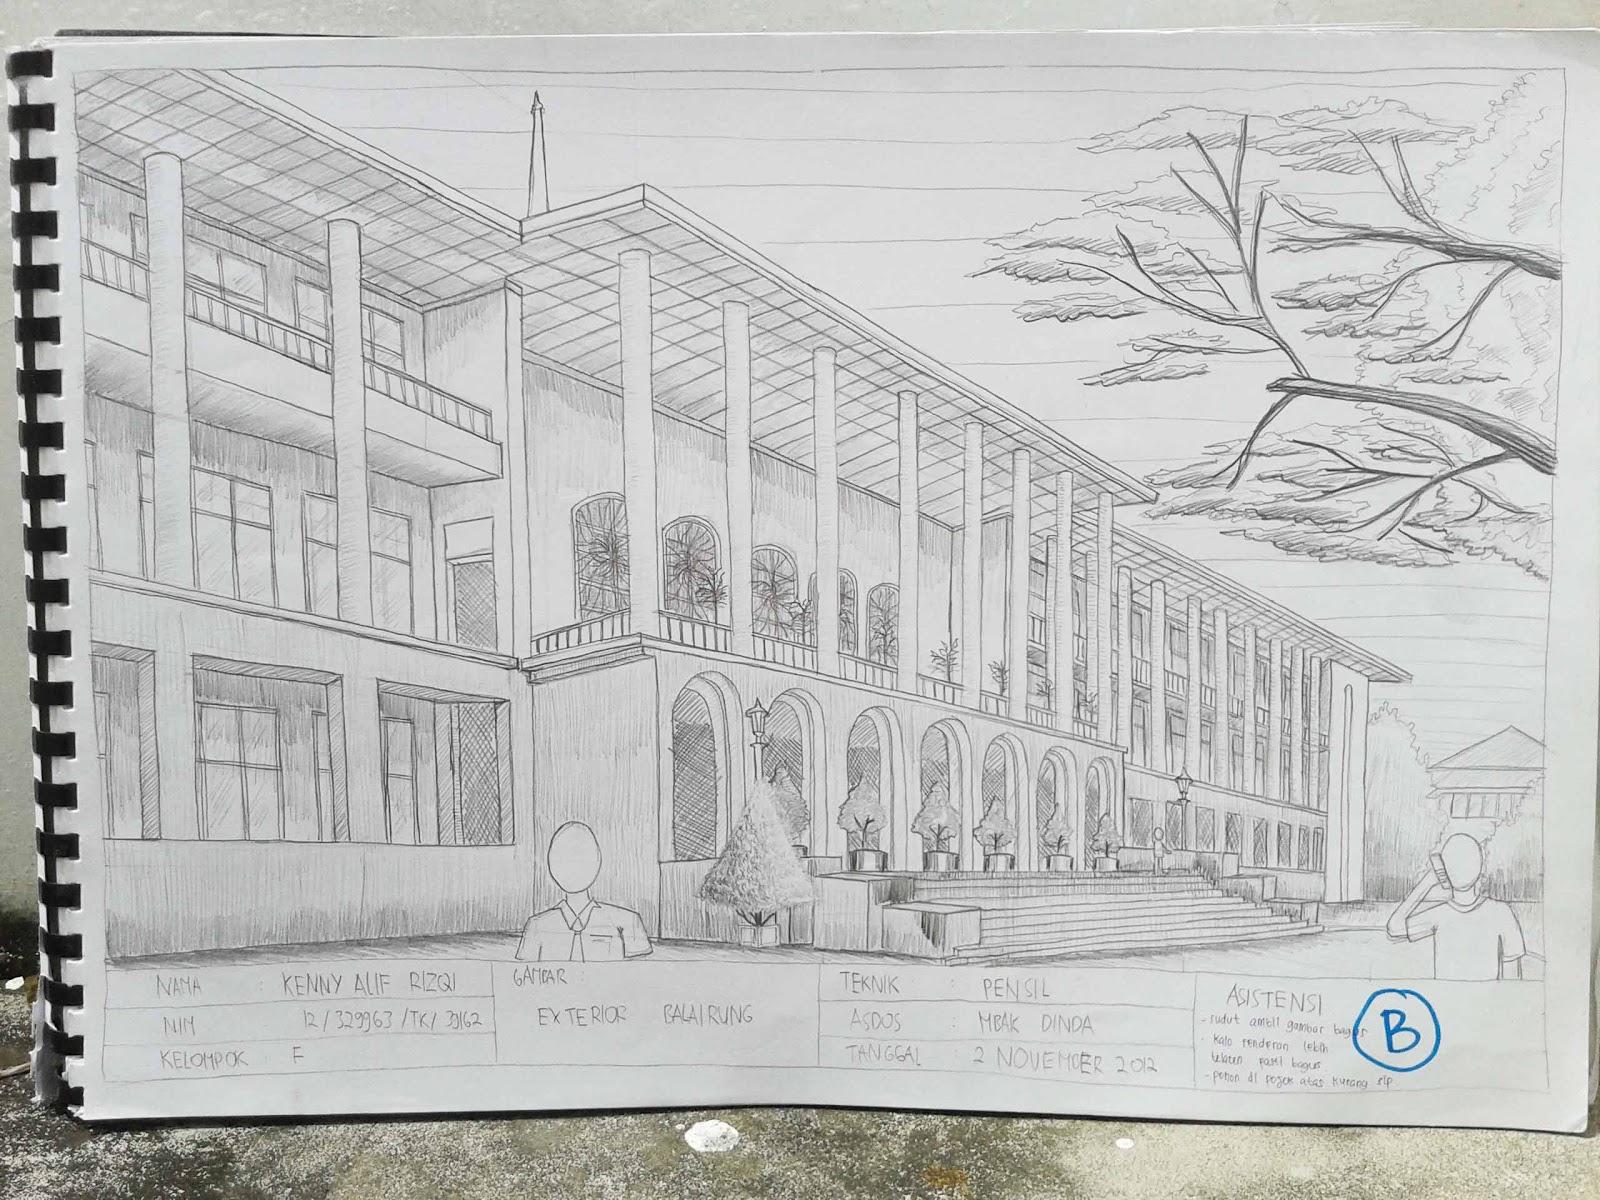 Gambar Sketsa Gedung Perkotaan Sobsketsa